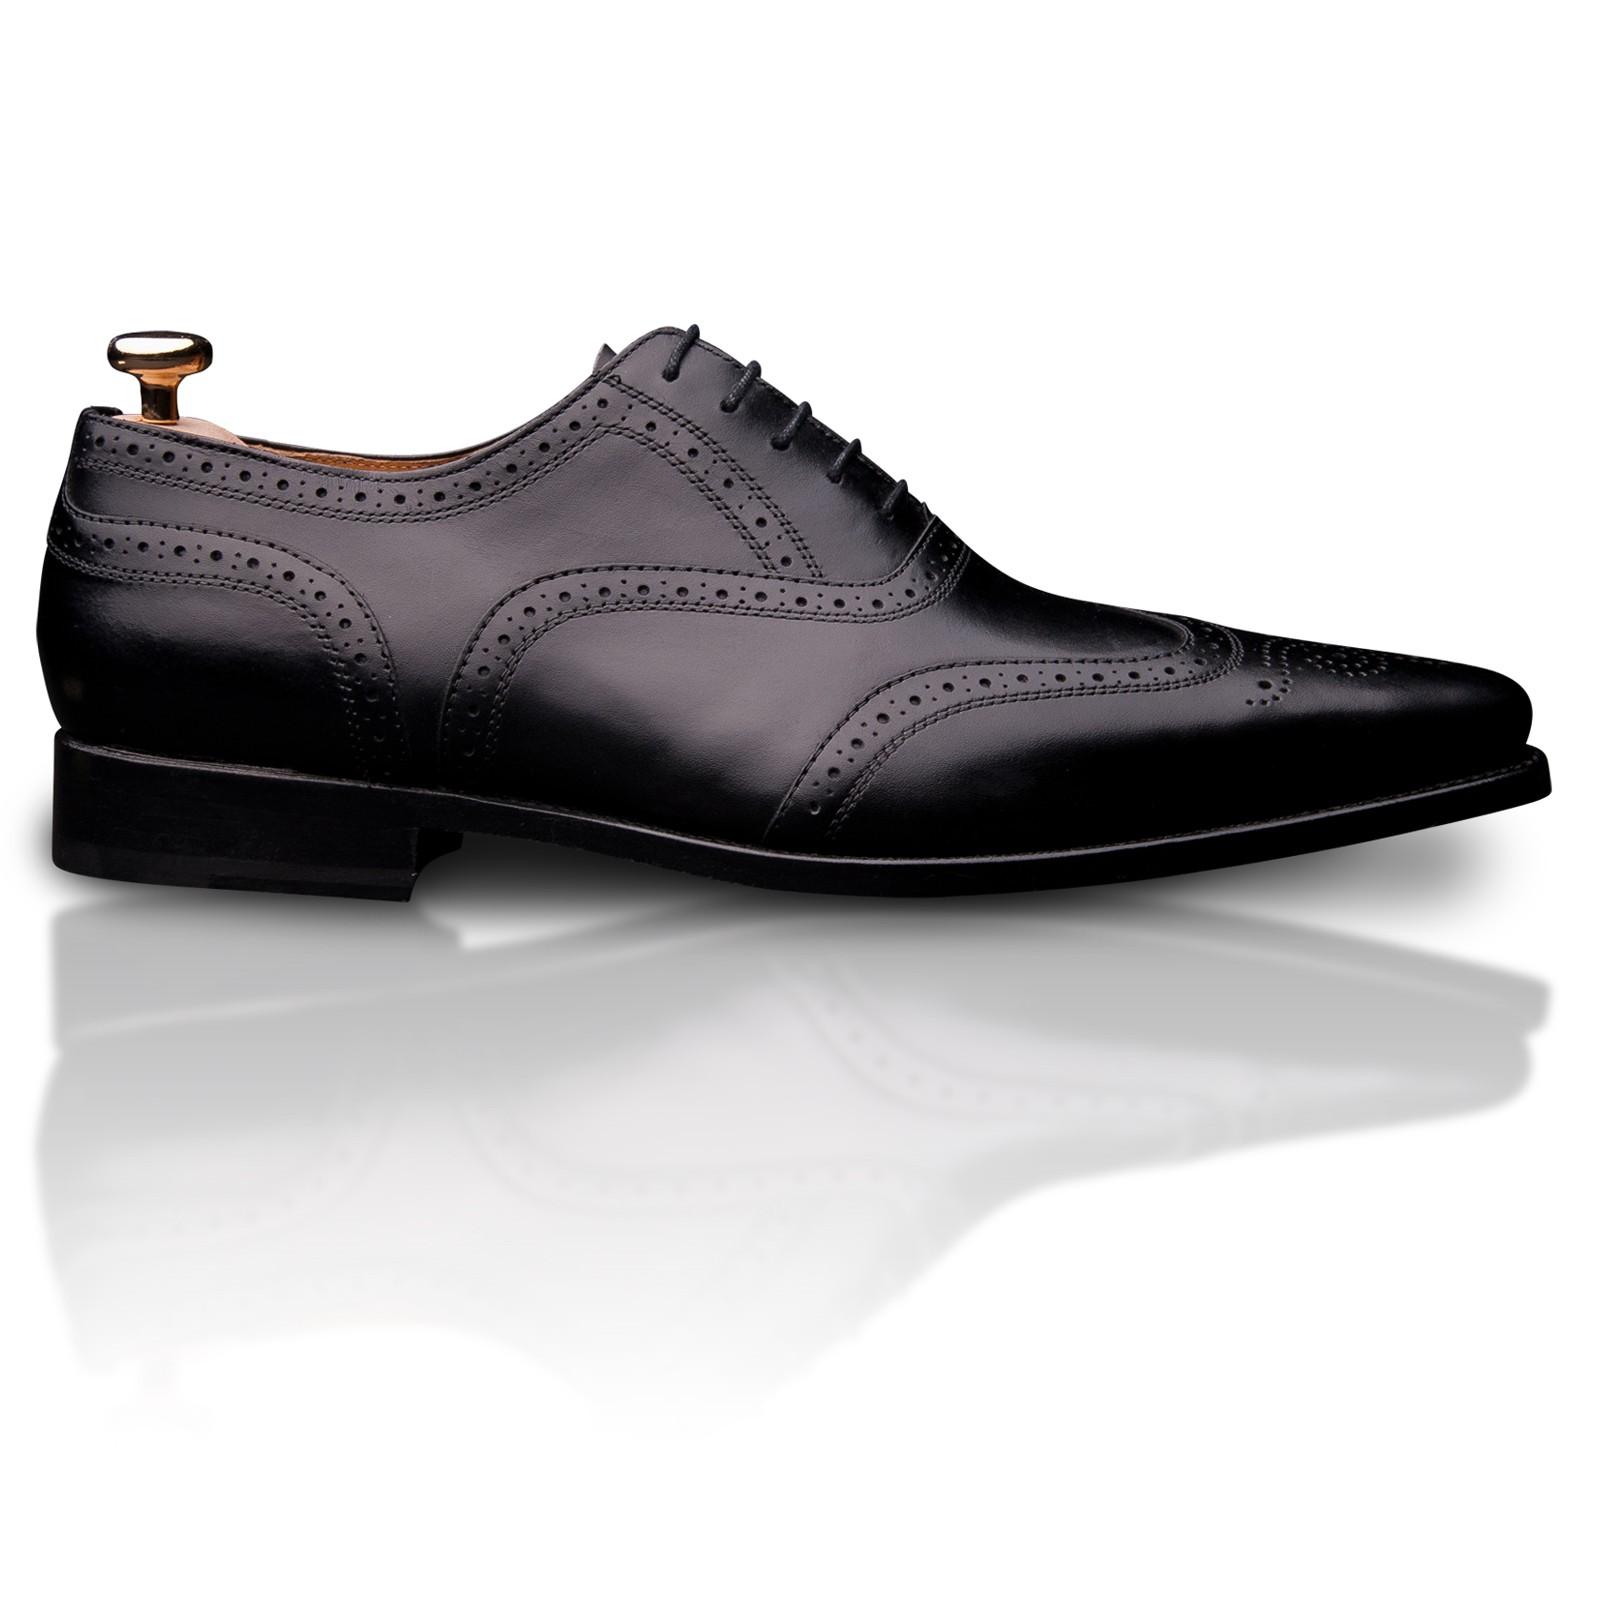 chaussures de tango marque turquoise chaussures marque flexible chaussure de marque remonte. Black Bedroom Furniture Sets. Home Design Ideas